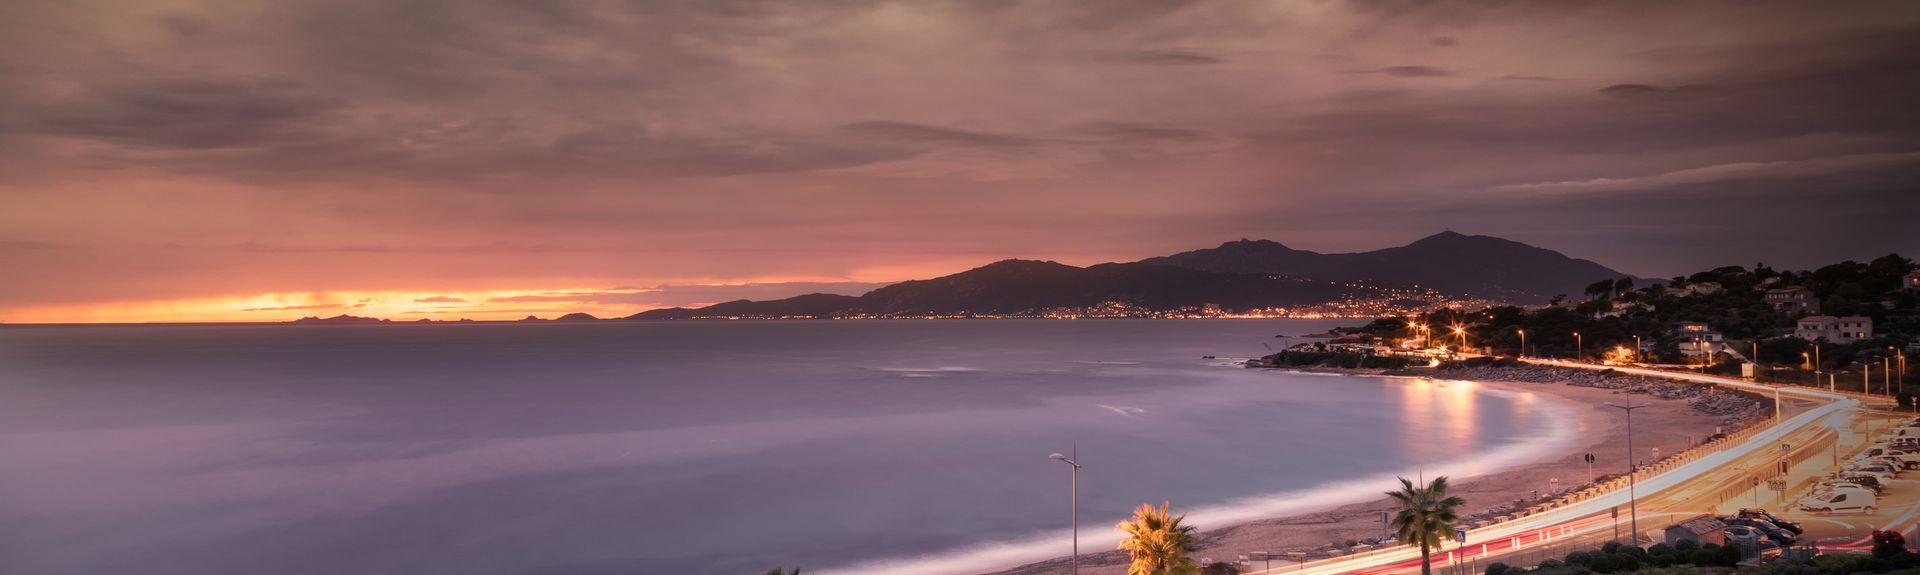 Porticcio, Grosseto-Prugna, Korsika, Frankreich